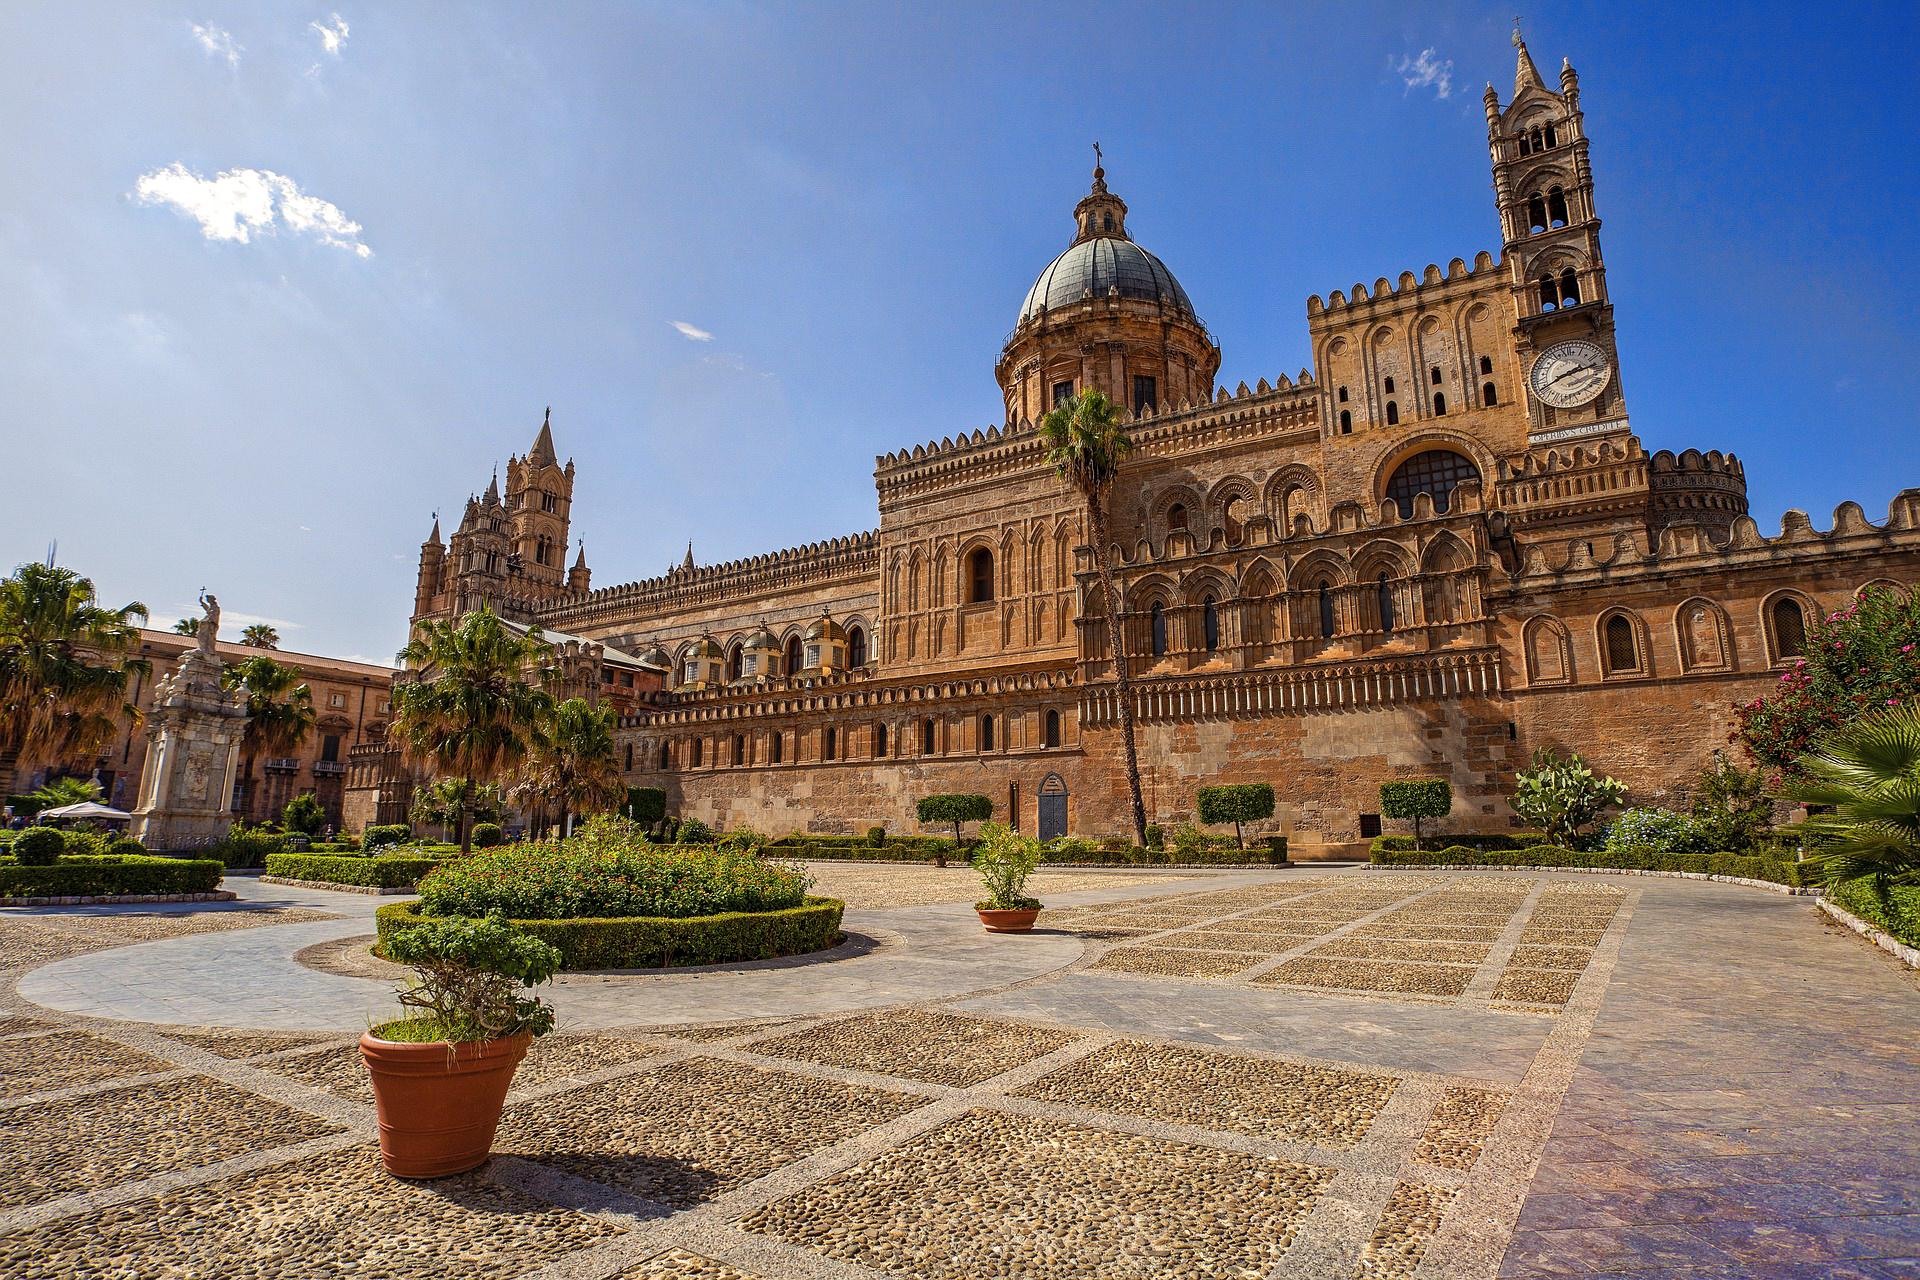 Dom in Palermo auf Sizilien